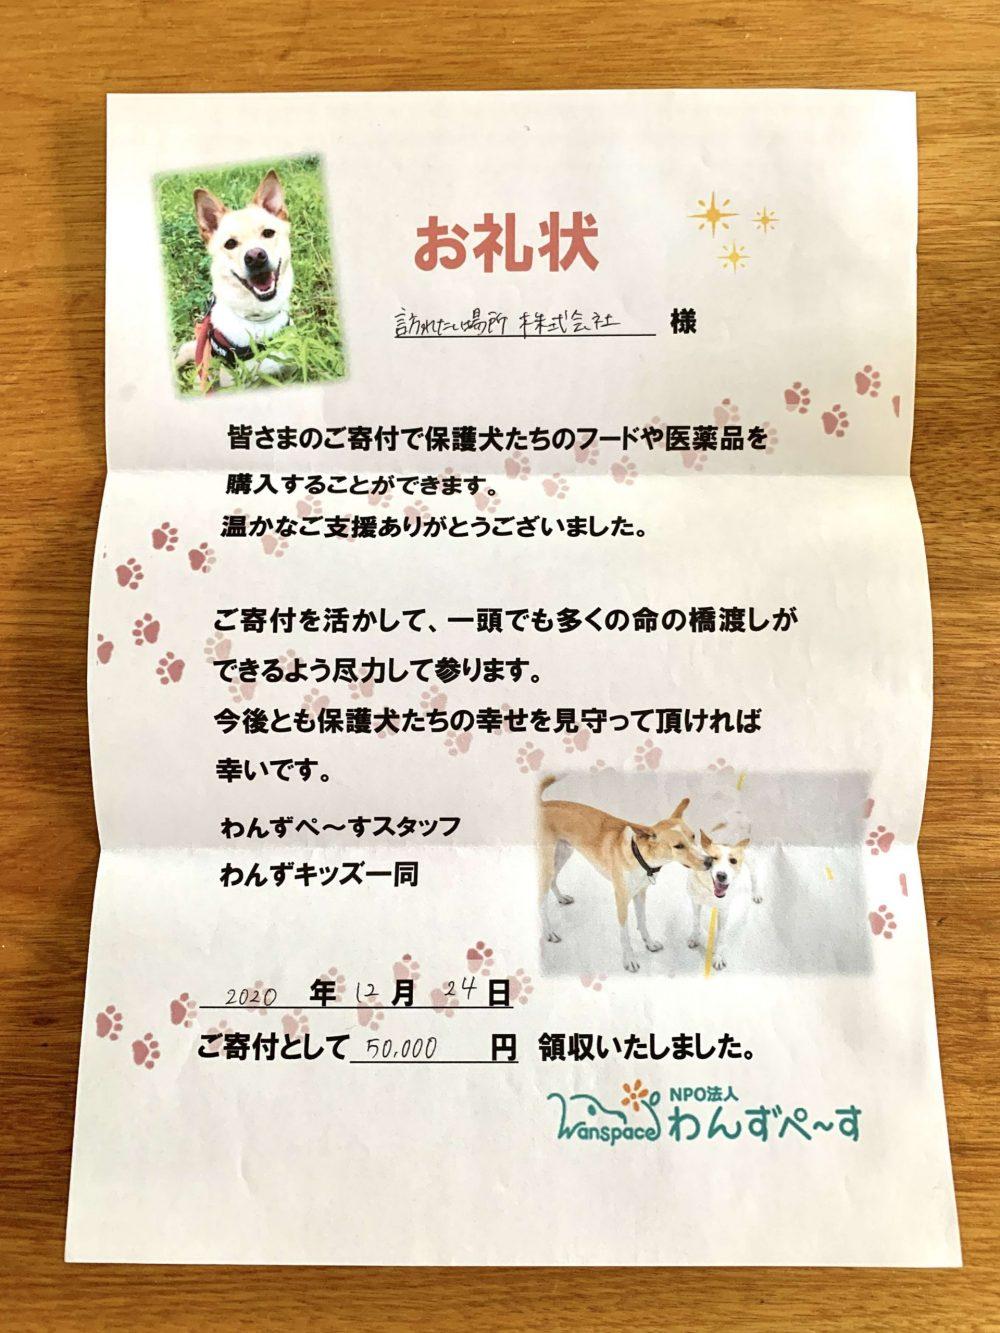 The Apoke 植物採集 わんぺ〜ず様への寄付ご報告